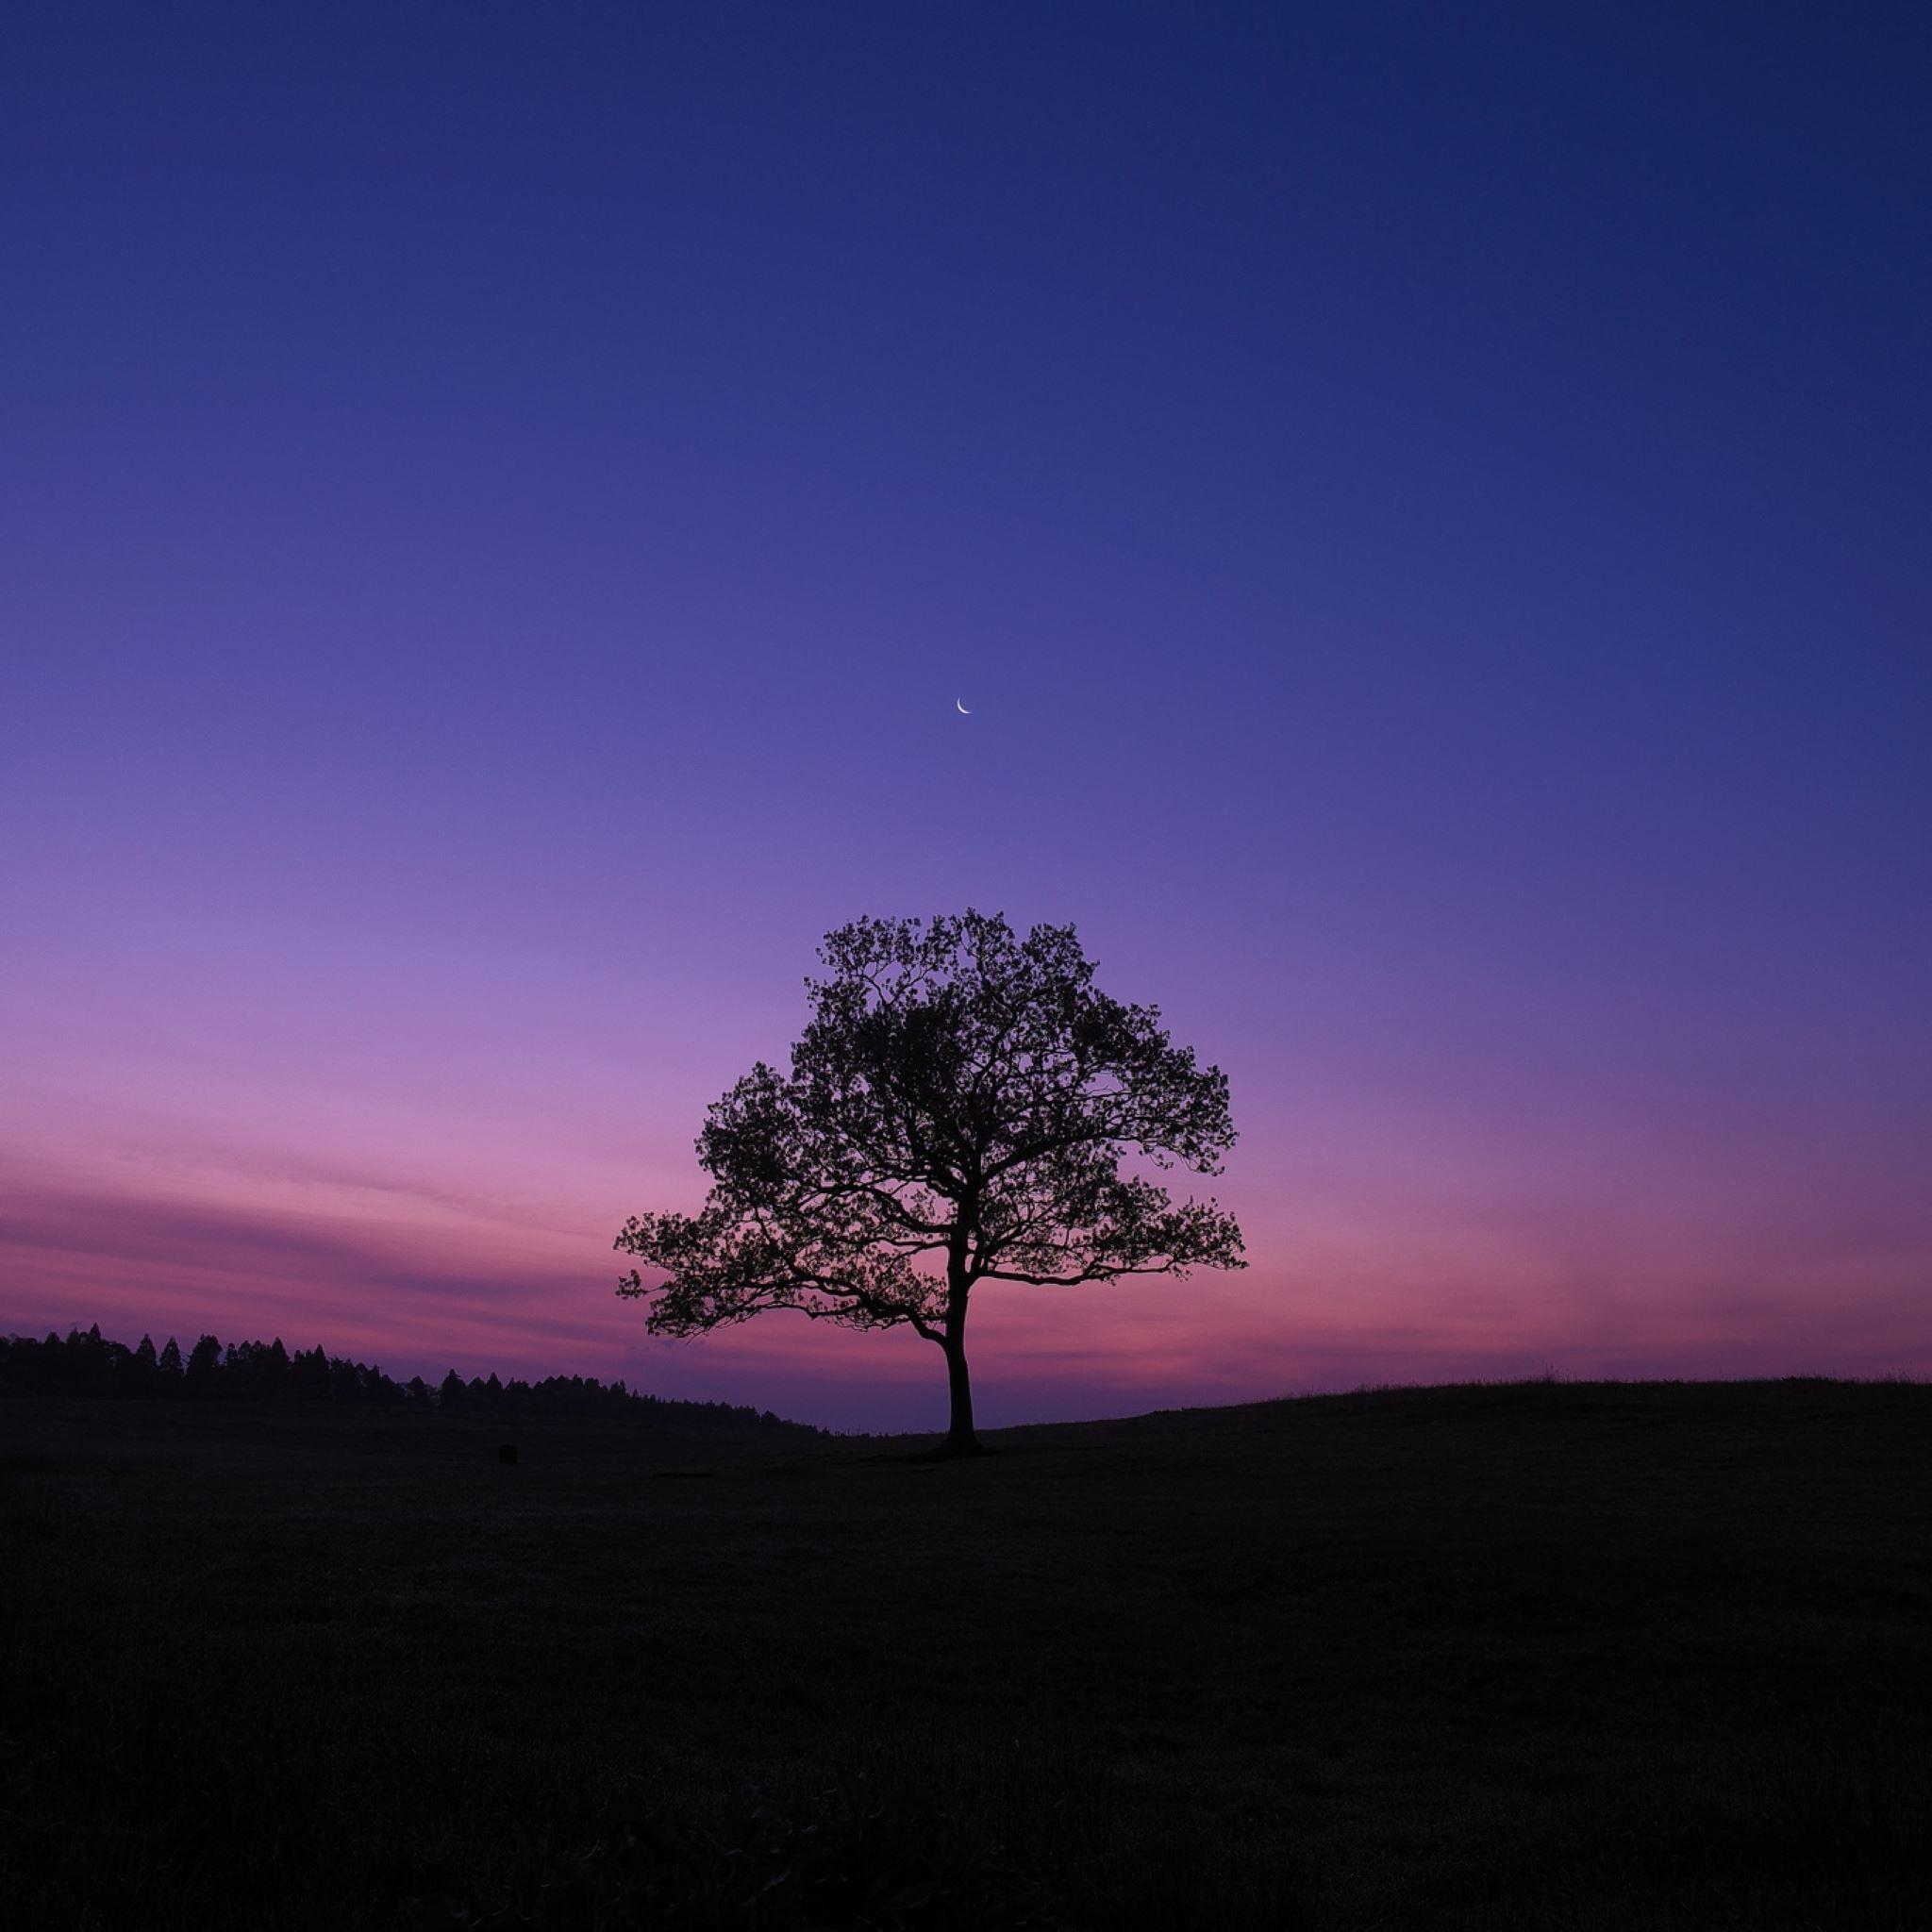 Tree night moon sky lonely iPad Air wallpaper